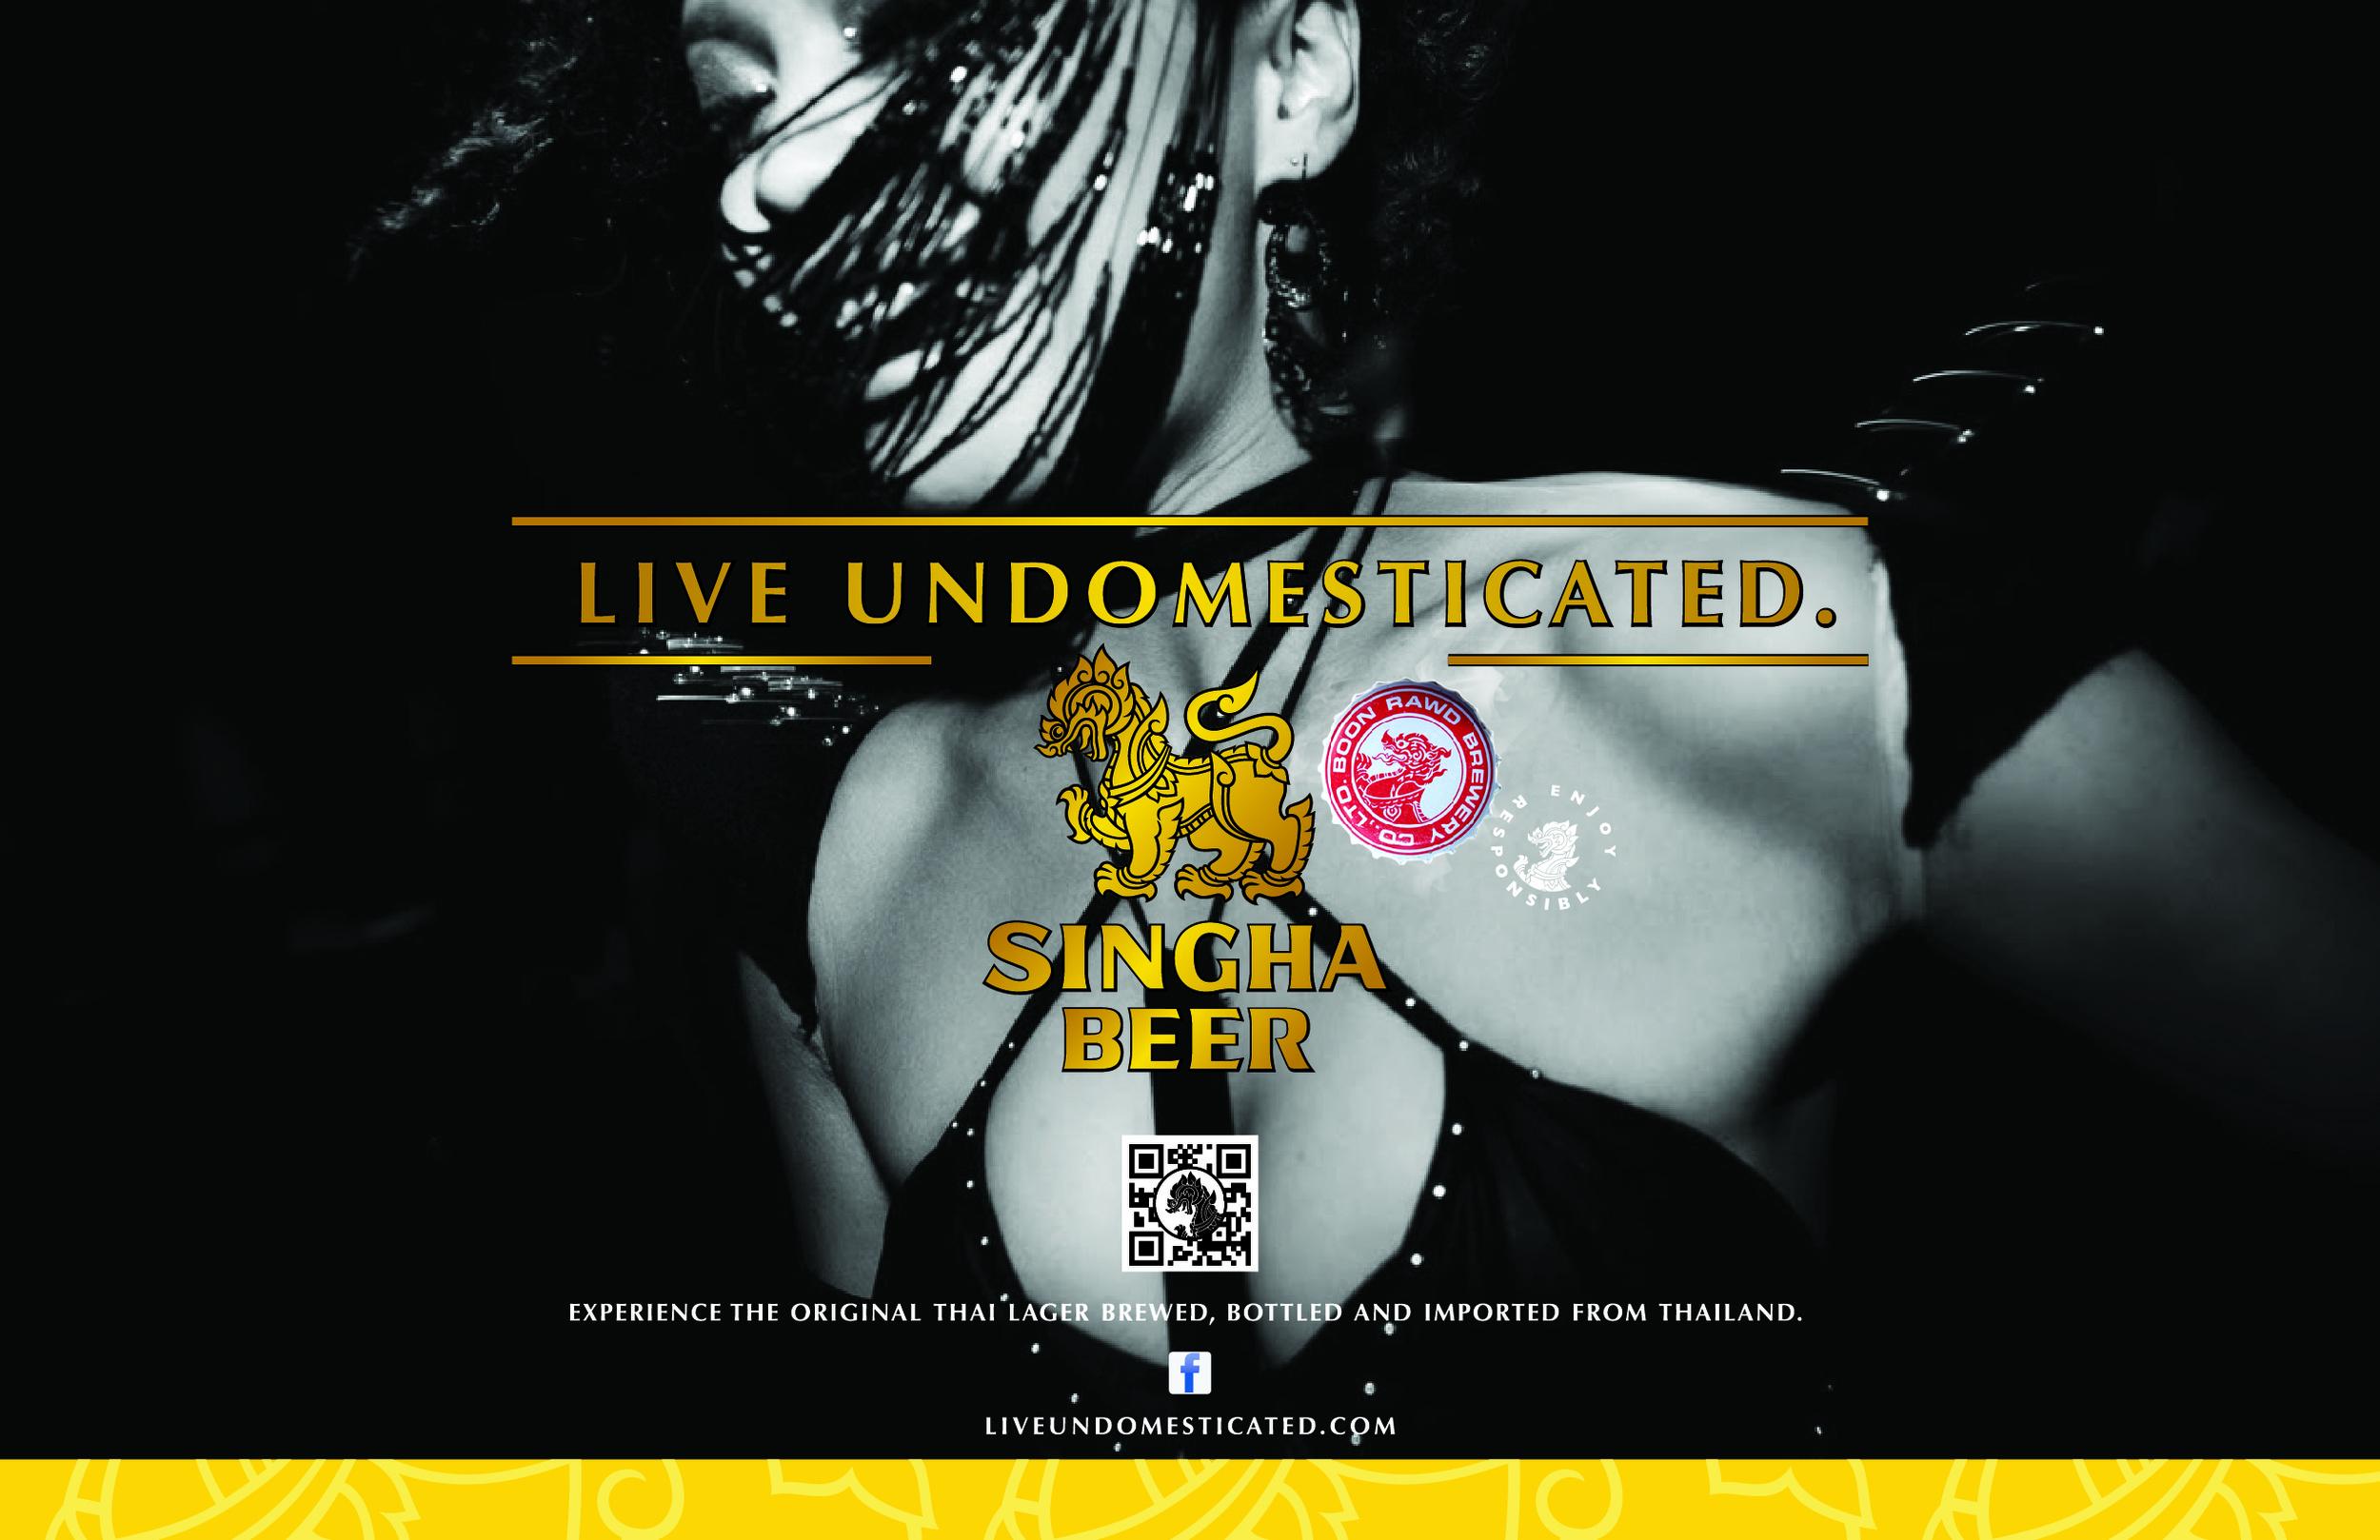 GERTRUDE_SINGHA BEER_LIVE UNDOMESTICATED_PRINT AD_SPREAD03.jpg